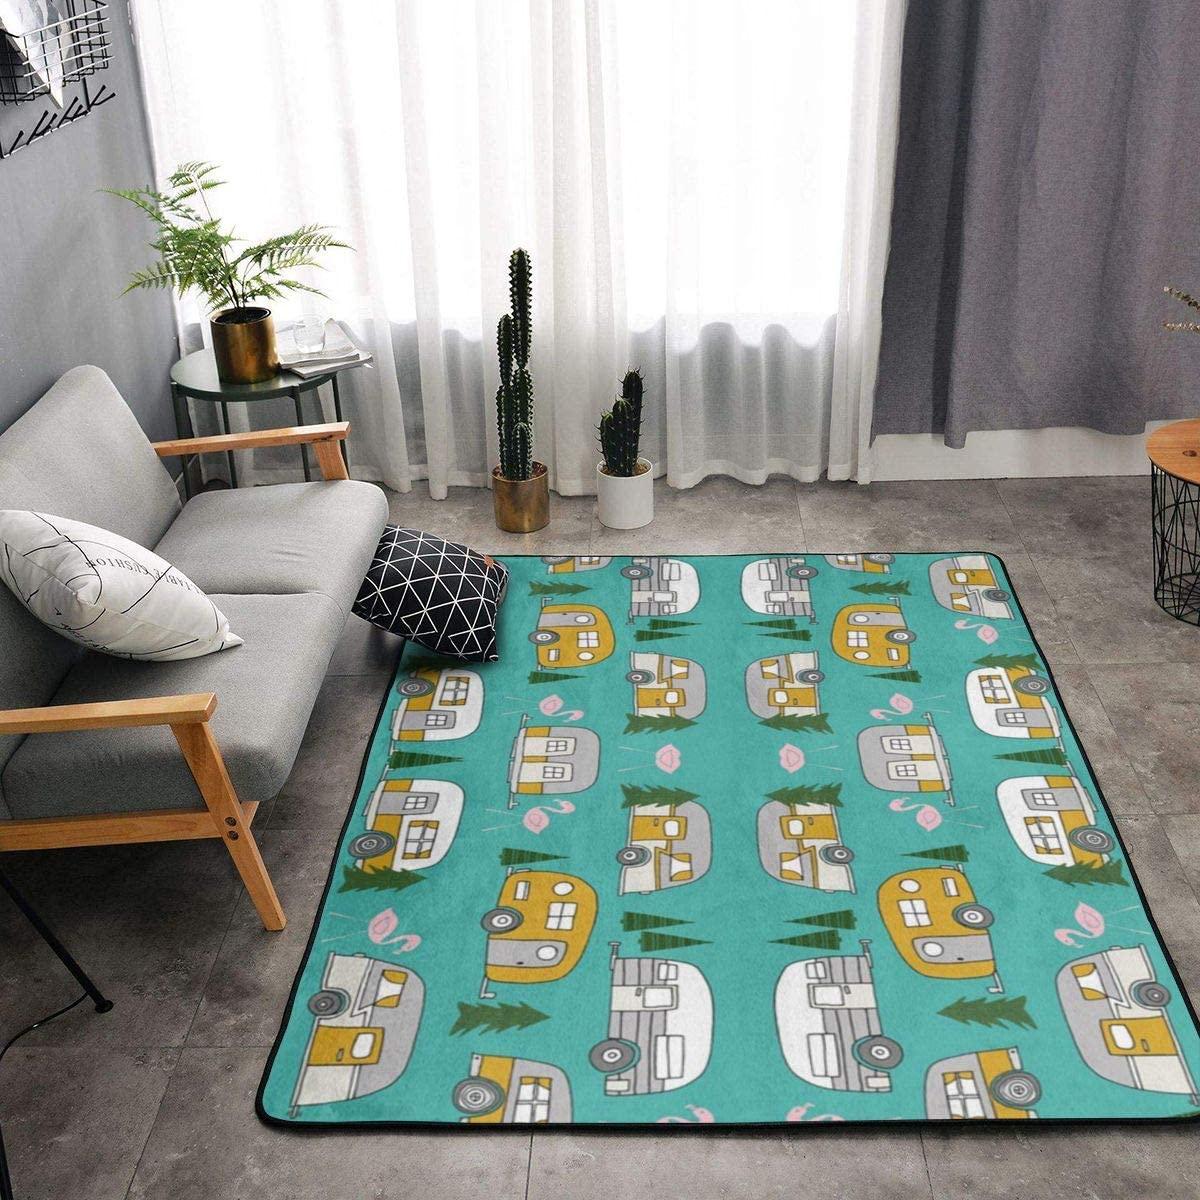 Fluffy Area Rug Modern Shag Rug Pads Fuzzy Nursery Carpet for Kids, Soft Plush Rugs for Living Room Children Bedroom Kitchen Home Decoration,Retro Camper Flamingo,63x48 in